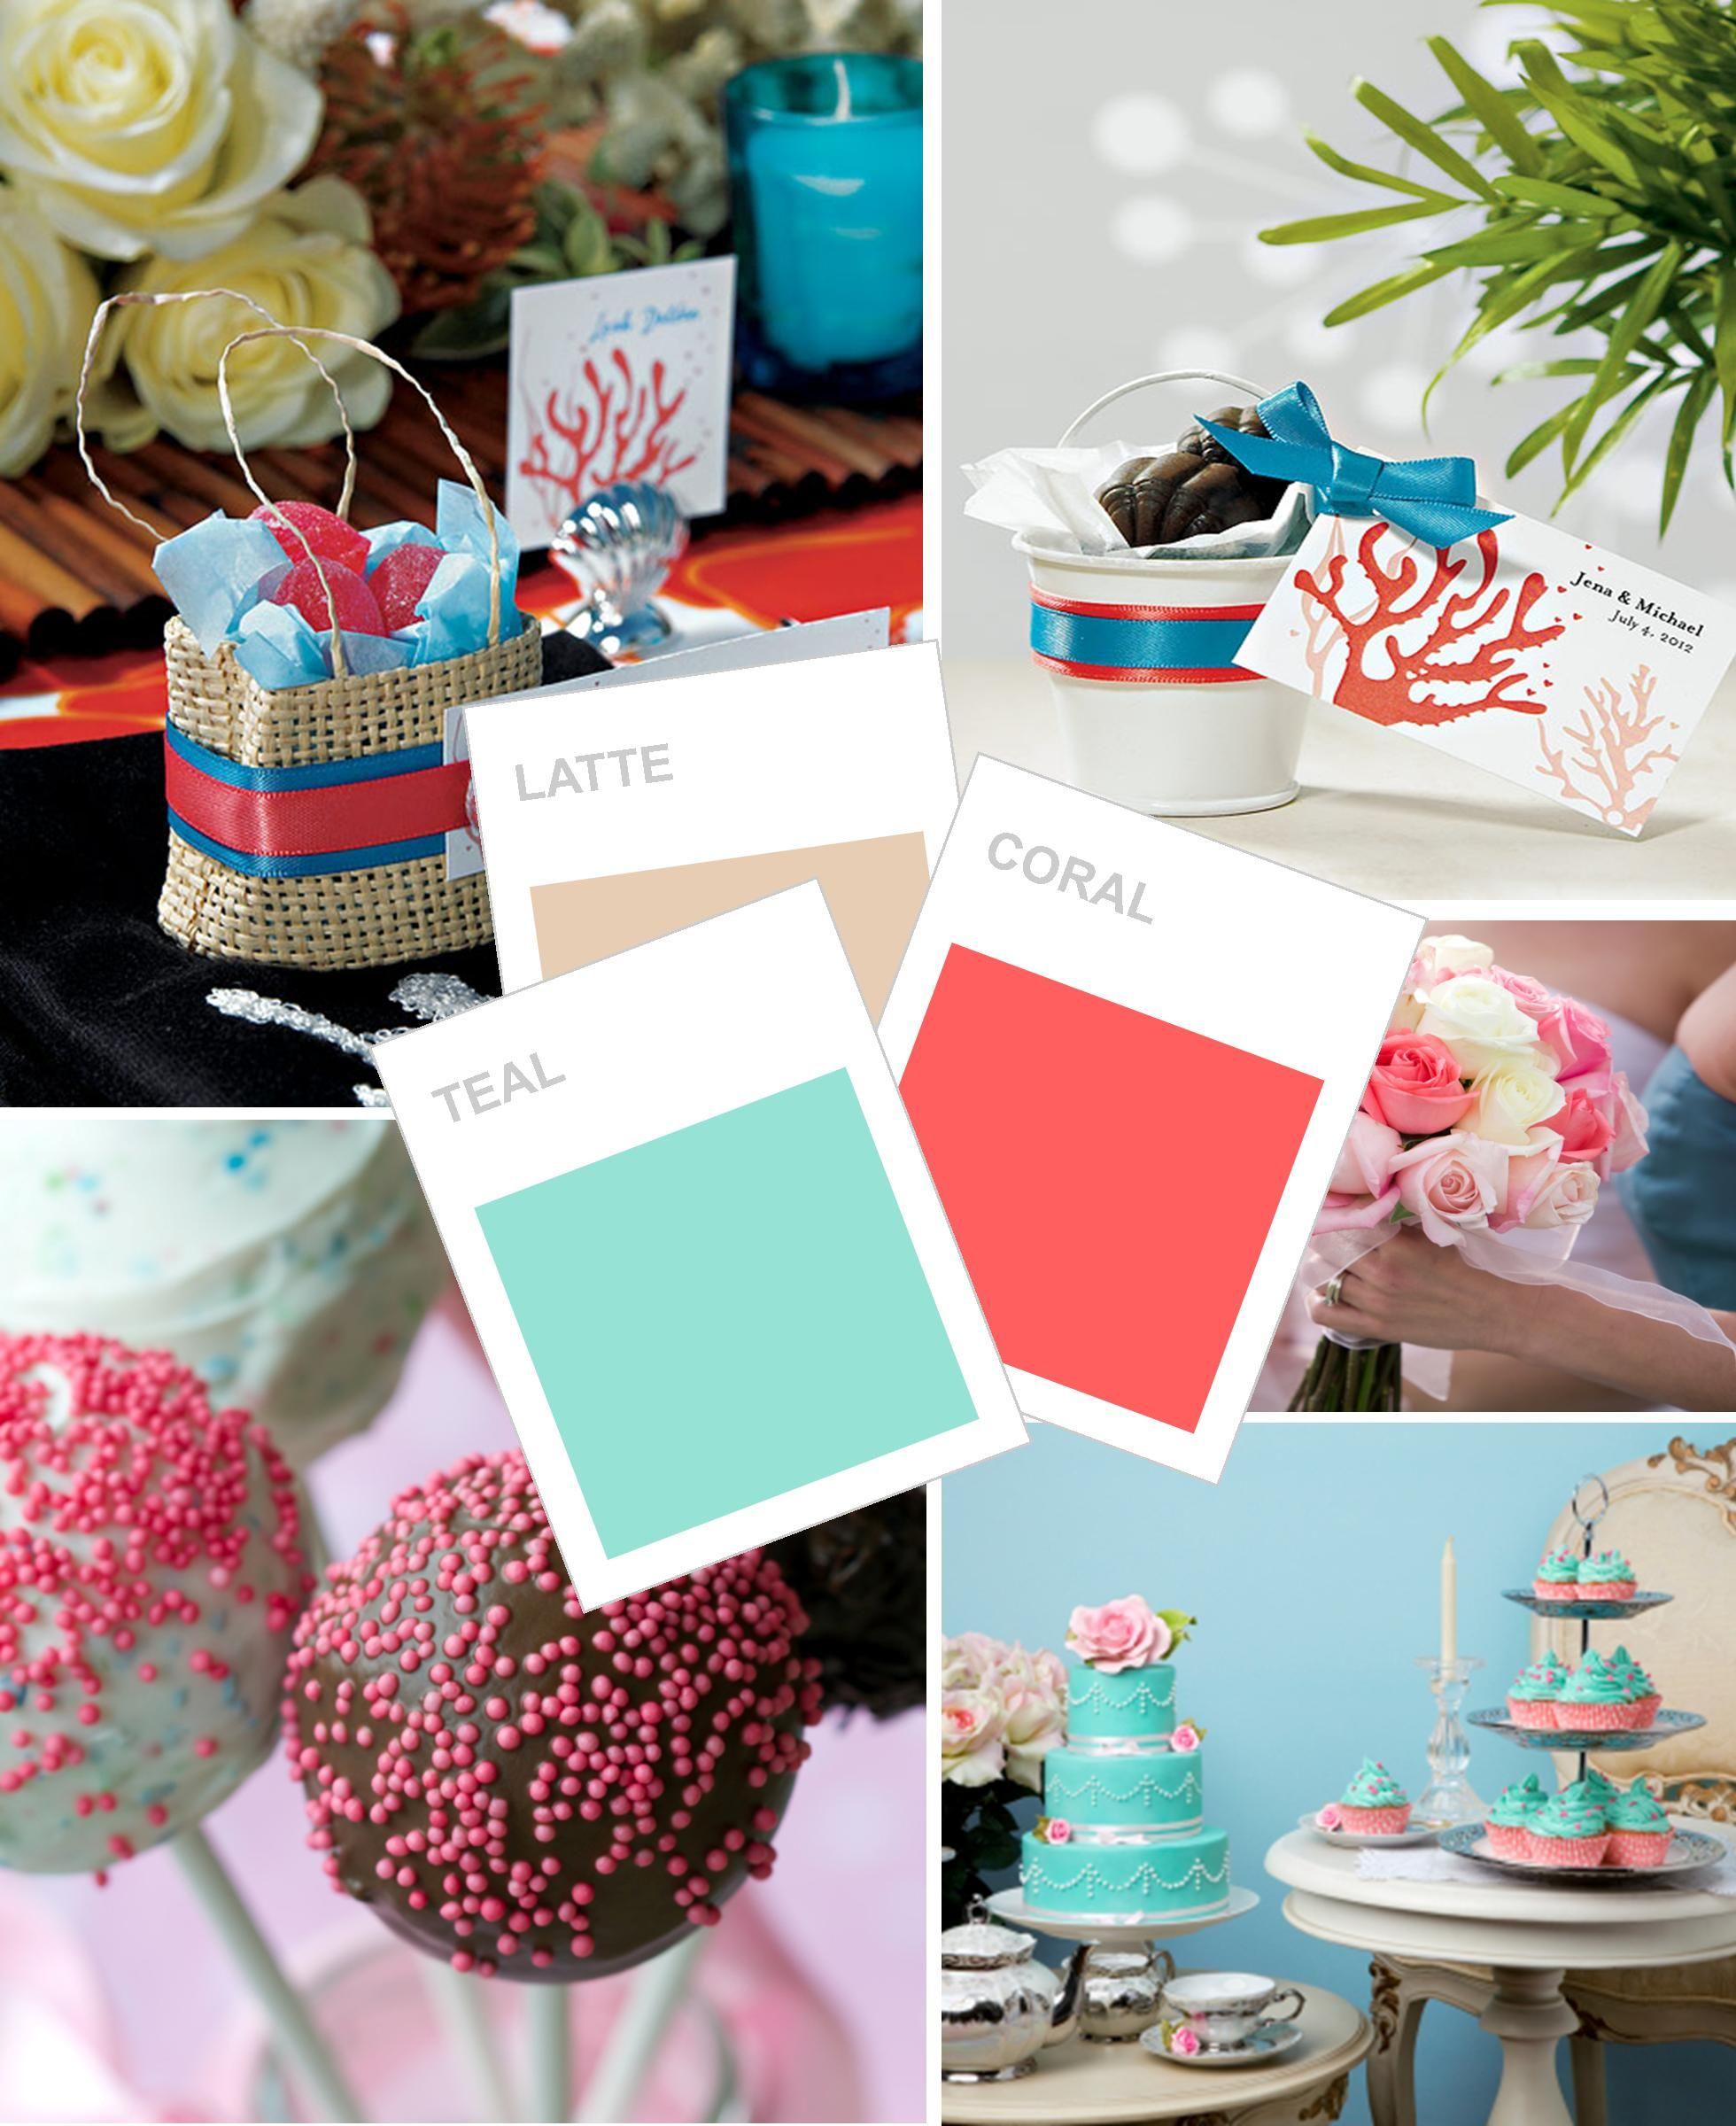 Key West Wedding Ideas: Coral, Teal And Latte Wedding